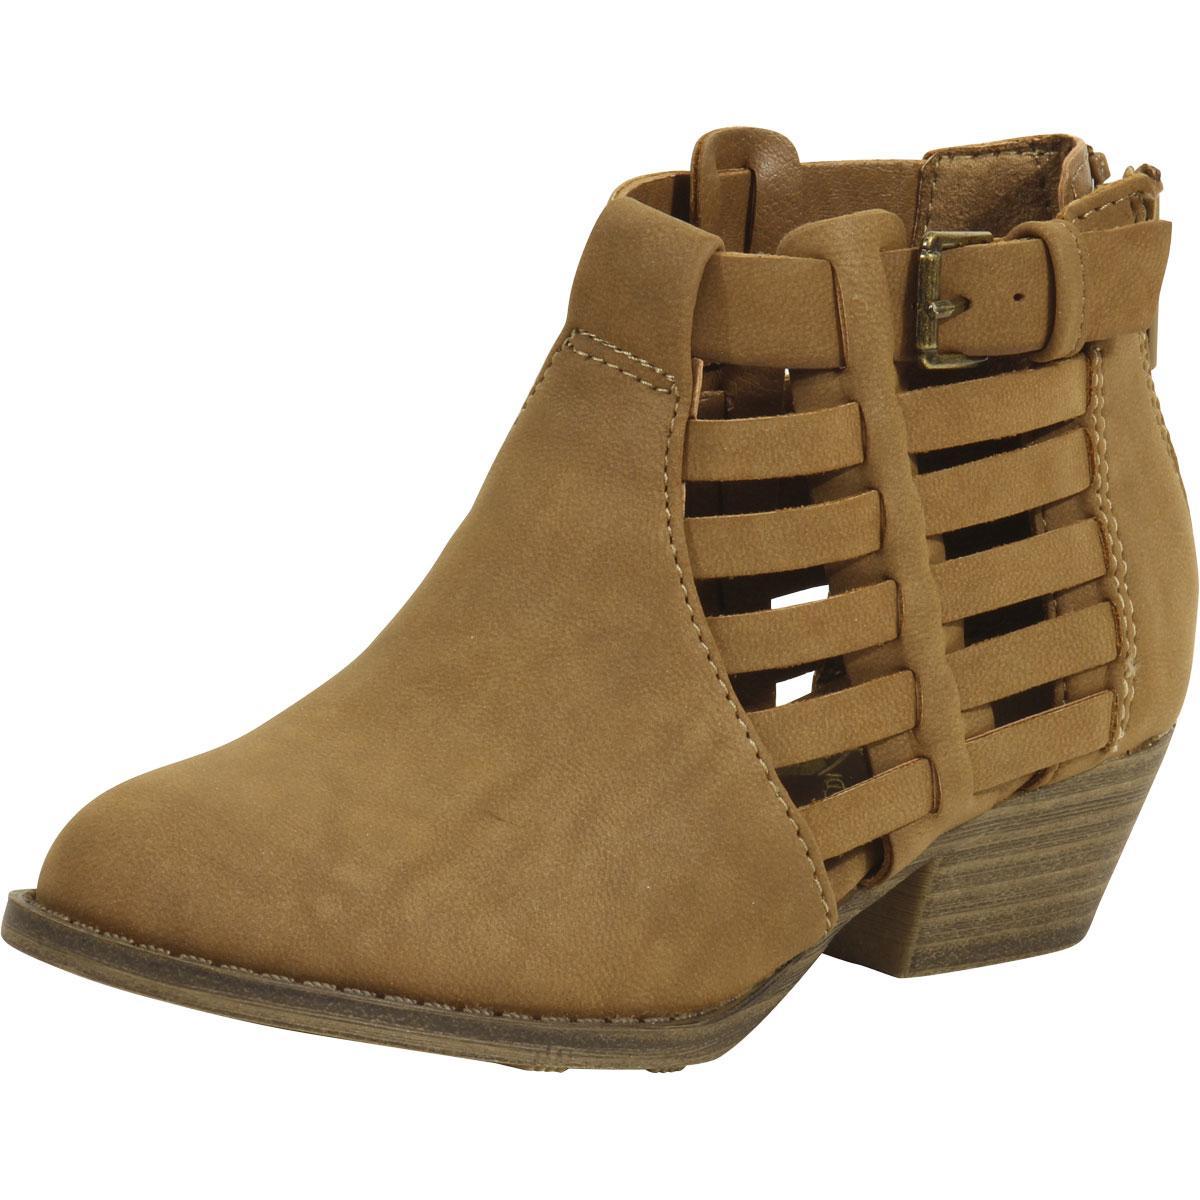 Cathie Cutout Ankle Boots Shoes